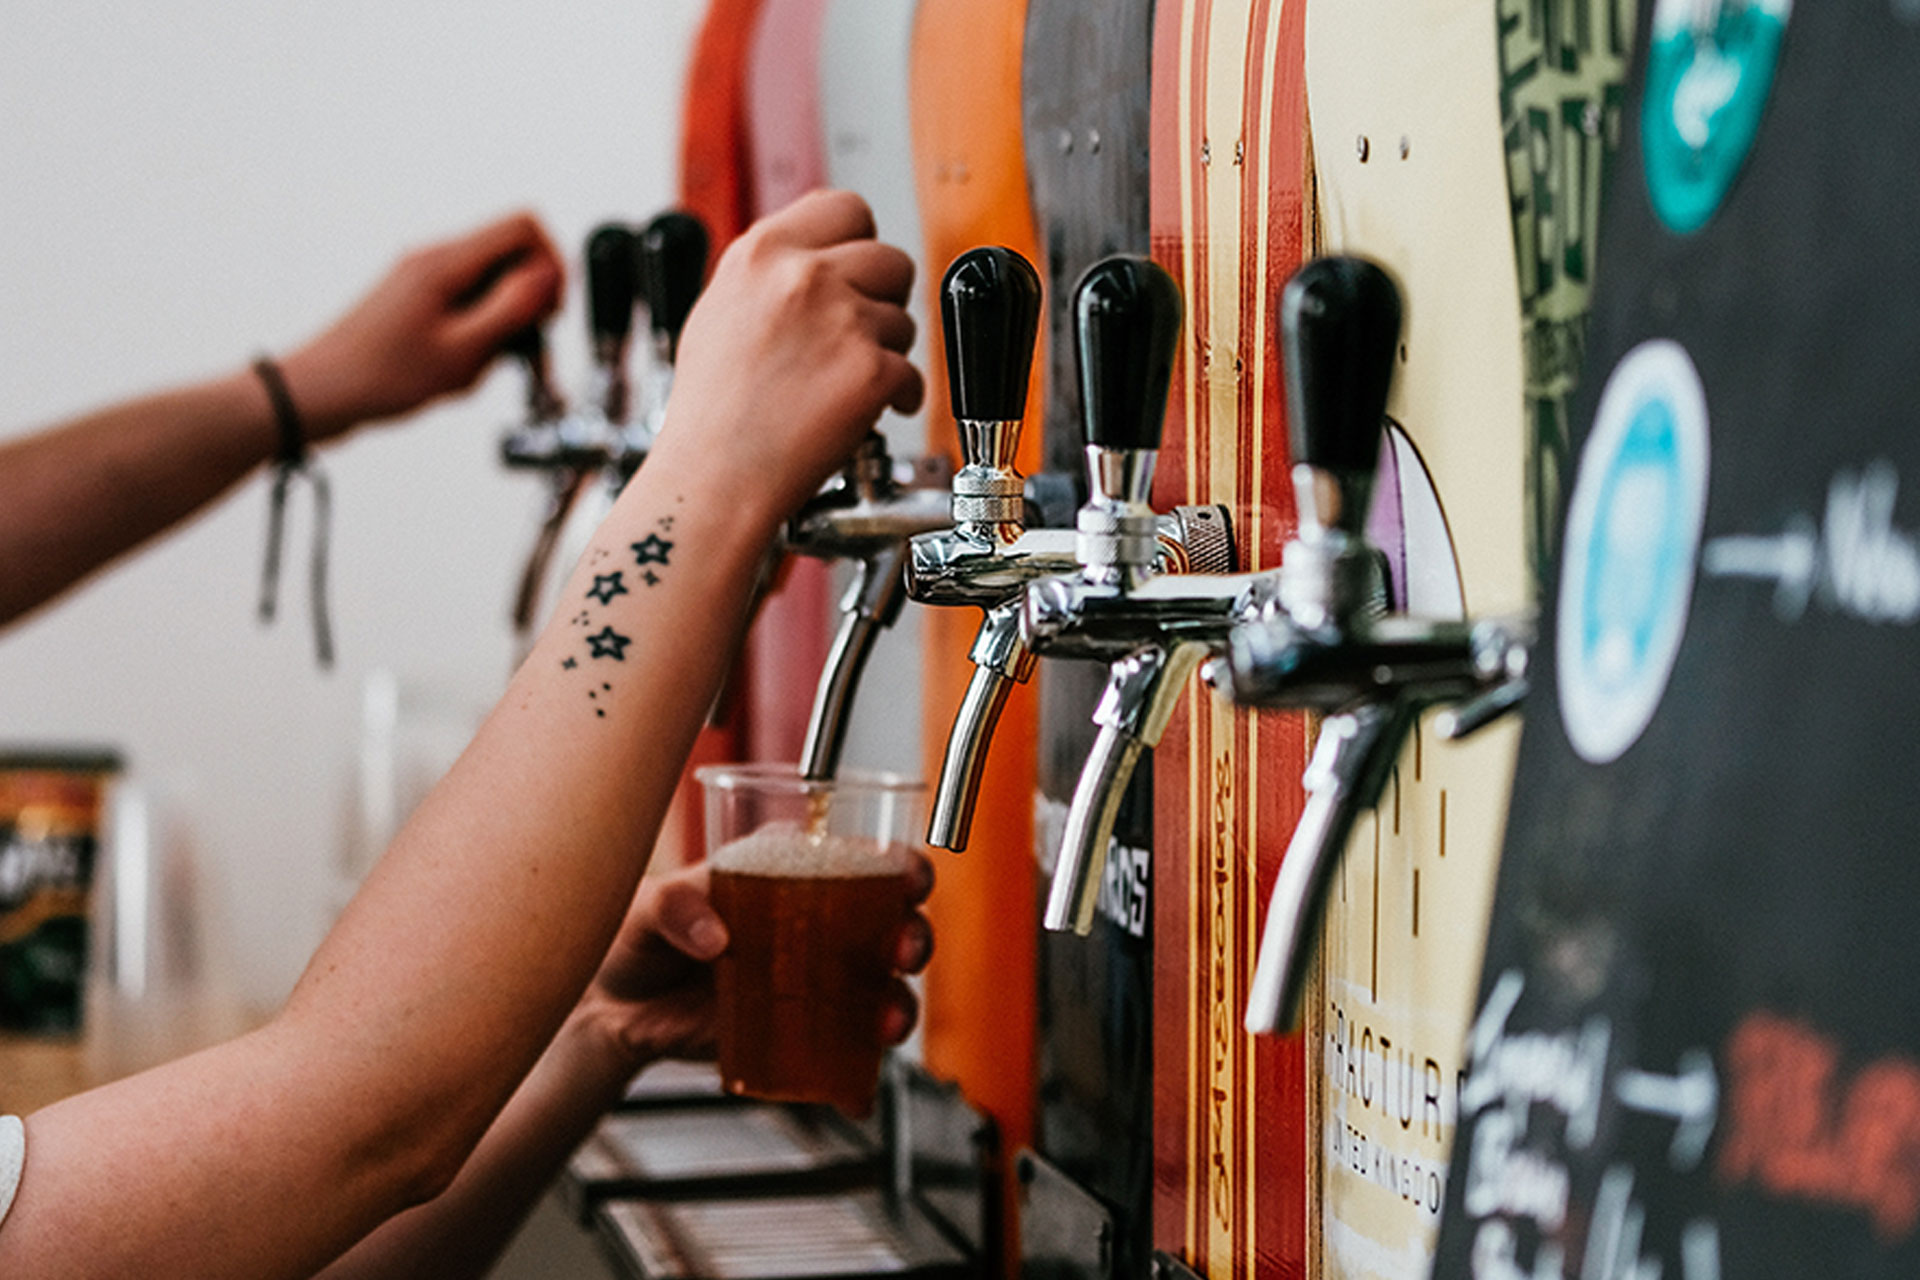 https://www.mncraftbrew.org/wp-content/uploads/2018/06/Find-Brewery-Home-3.jpg